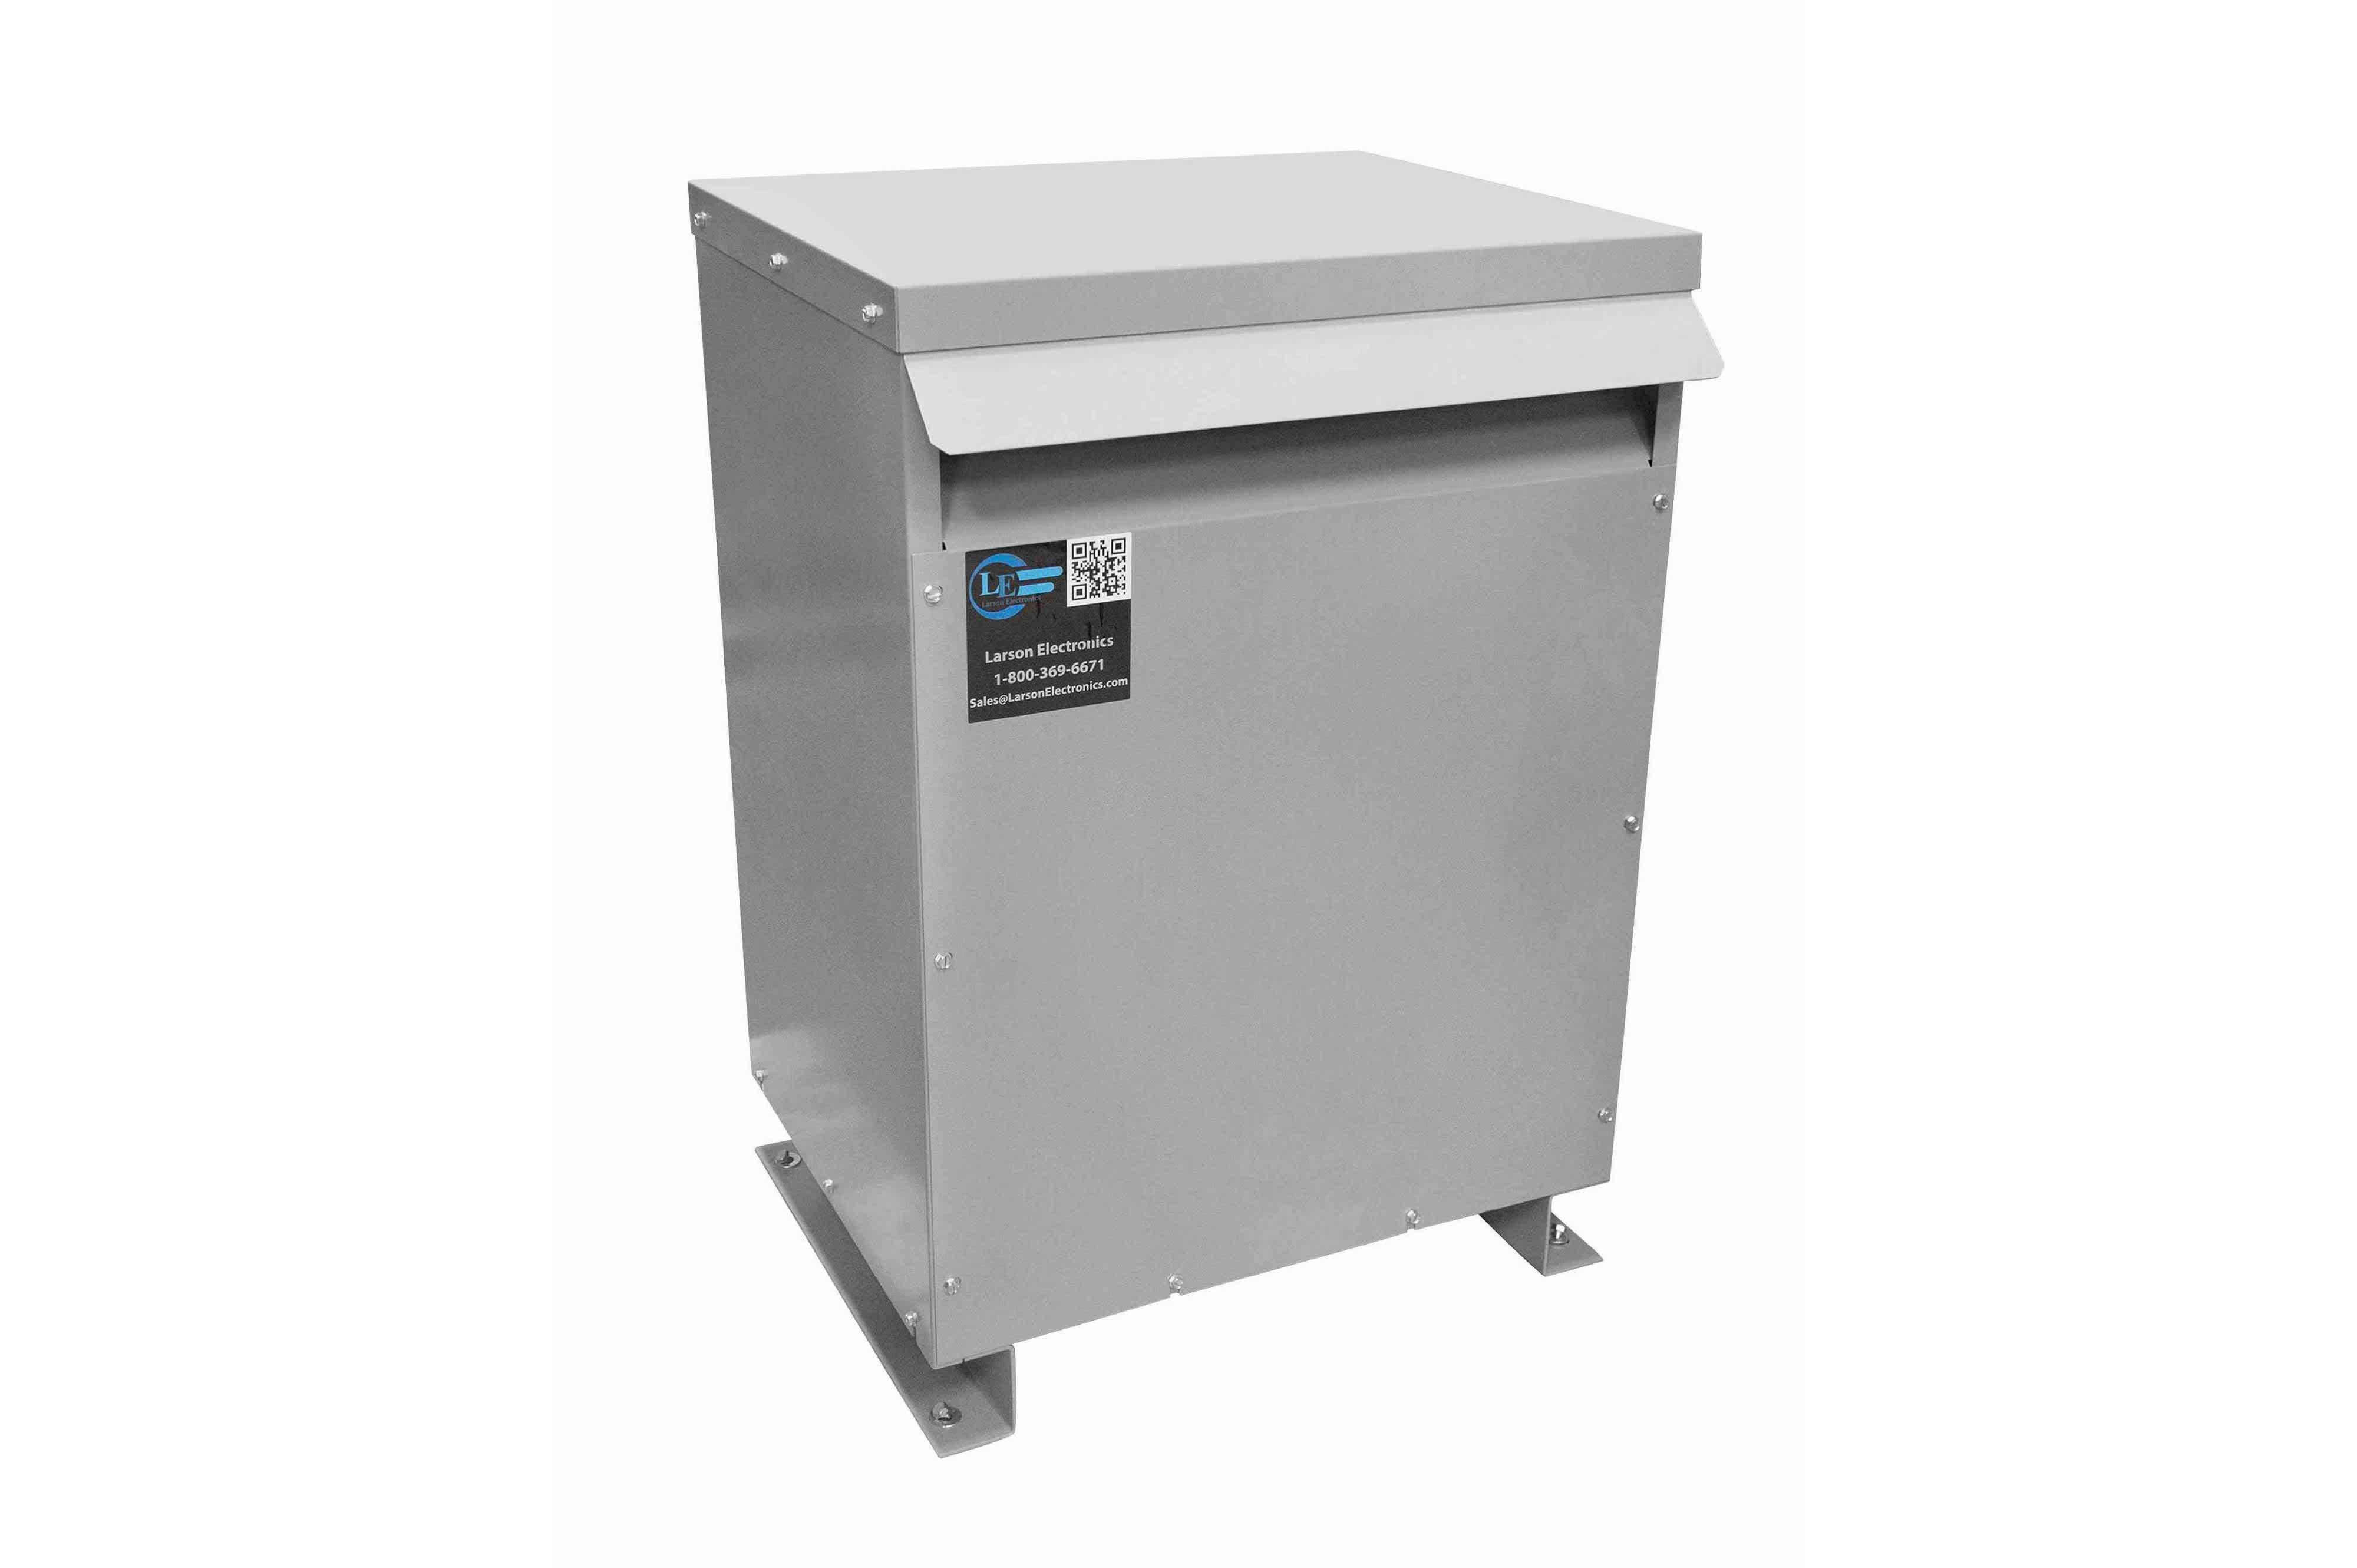 115 kVA 3PH Isolation Transformer, 230V Wye Primary, 208Y/120 Wye-N Secondary, N3R, Ventilated, 60 Hz